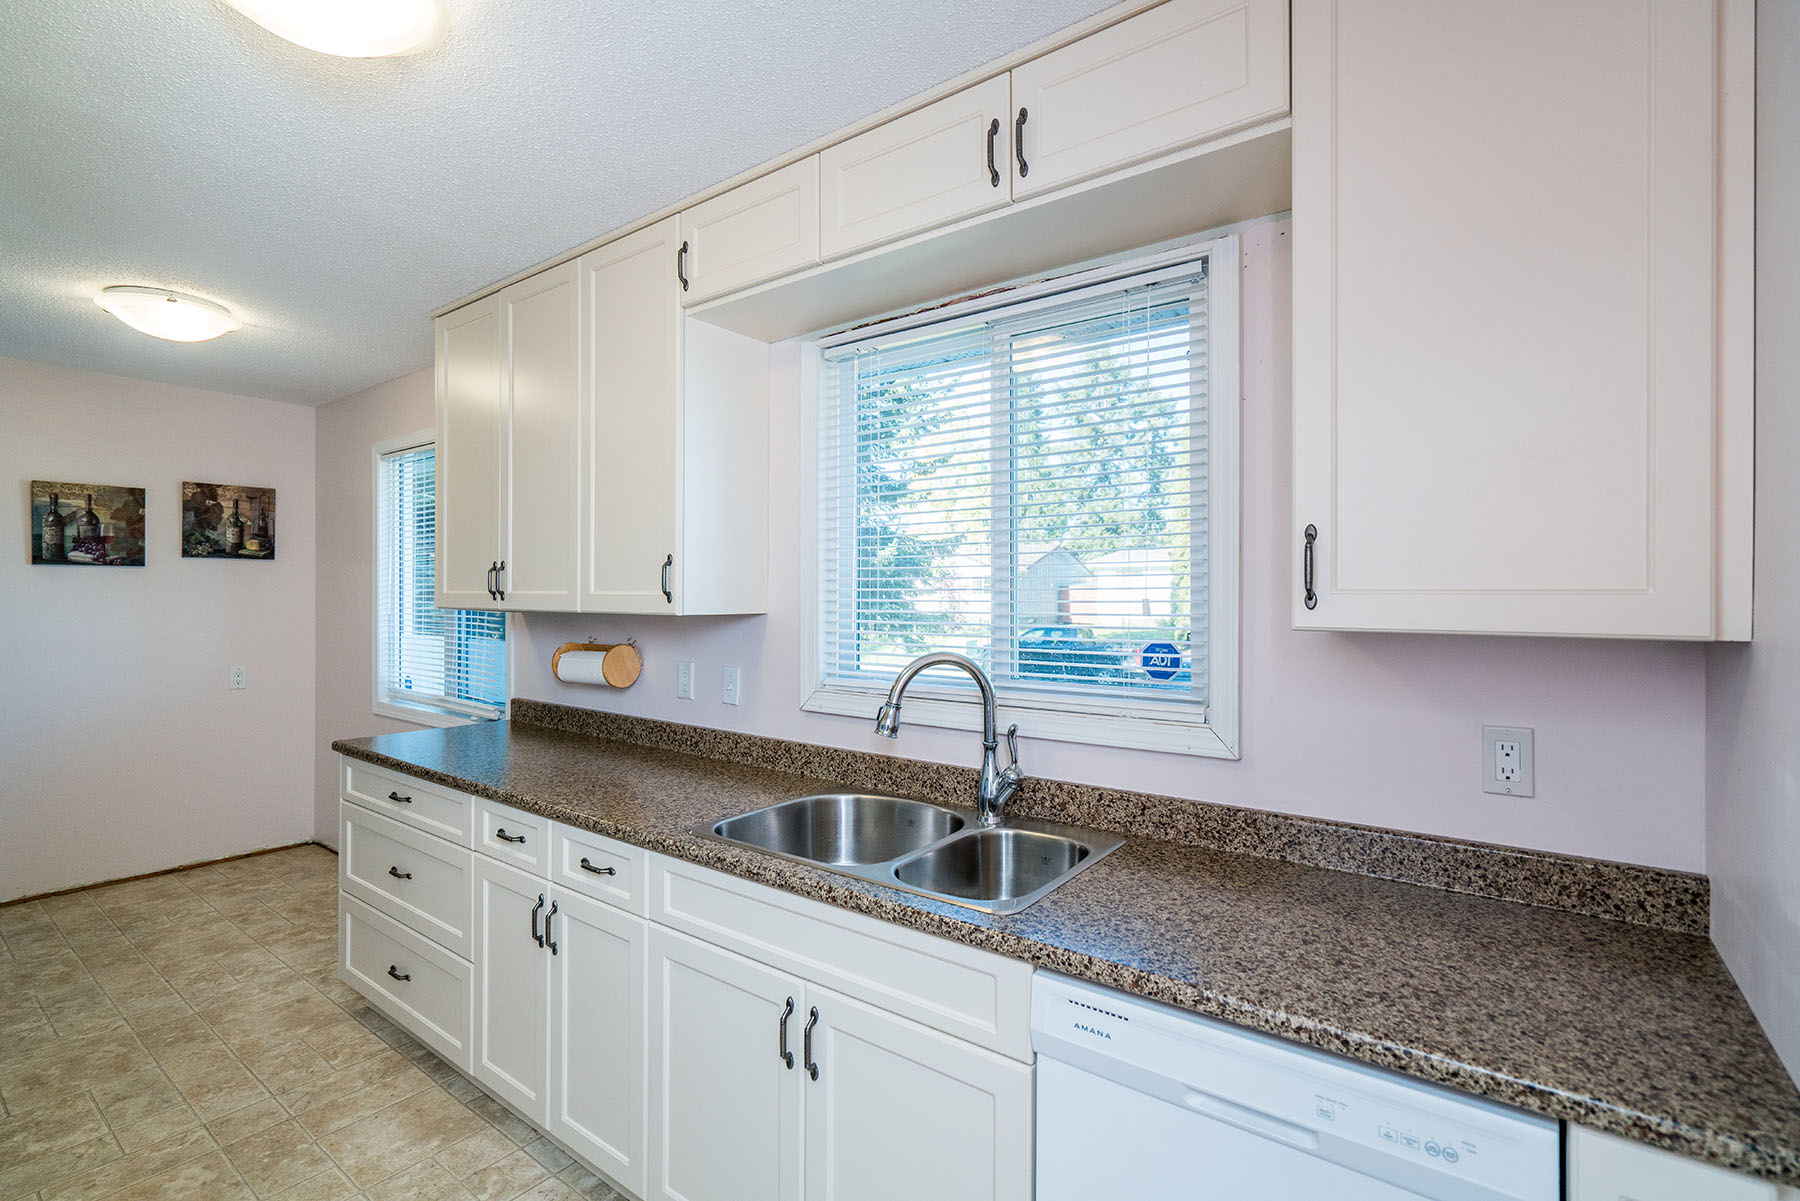 Kitchen - Pearson 002